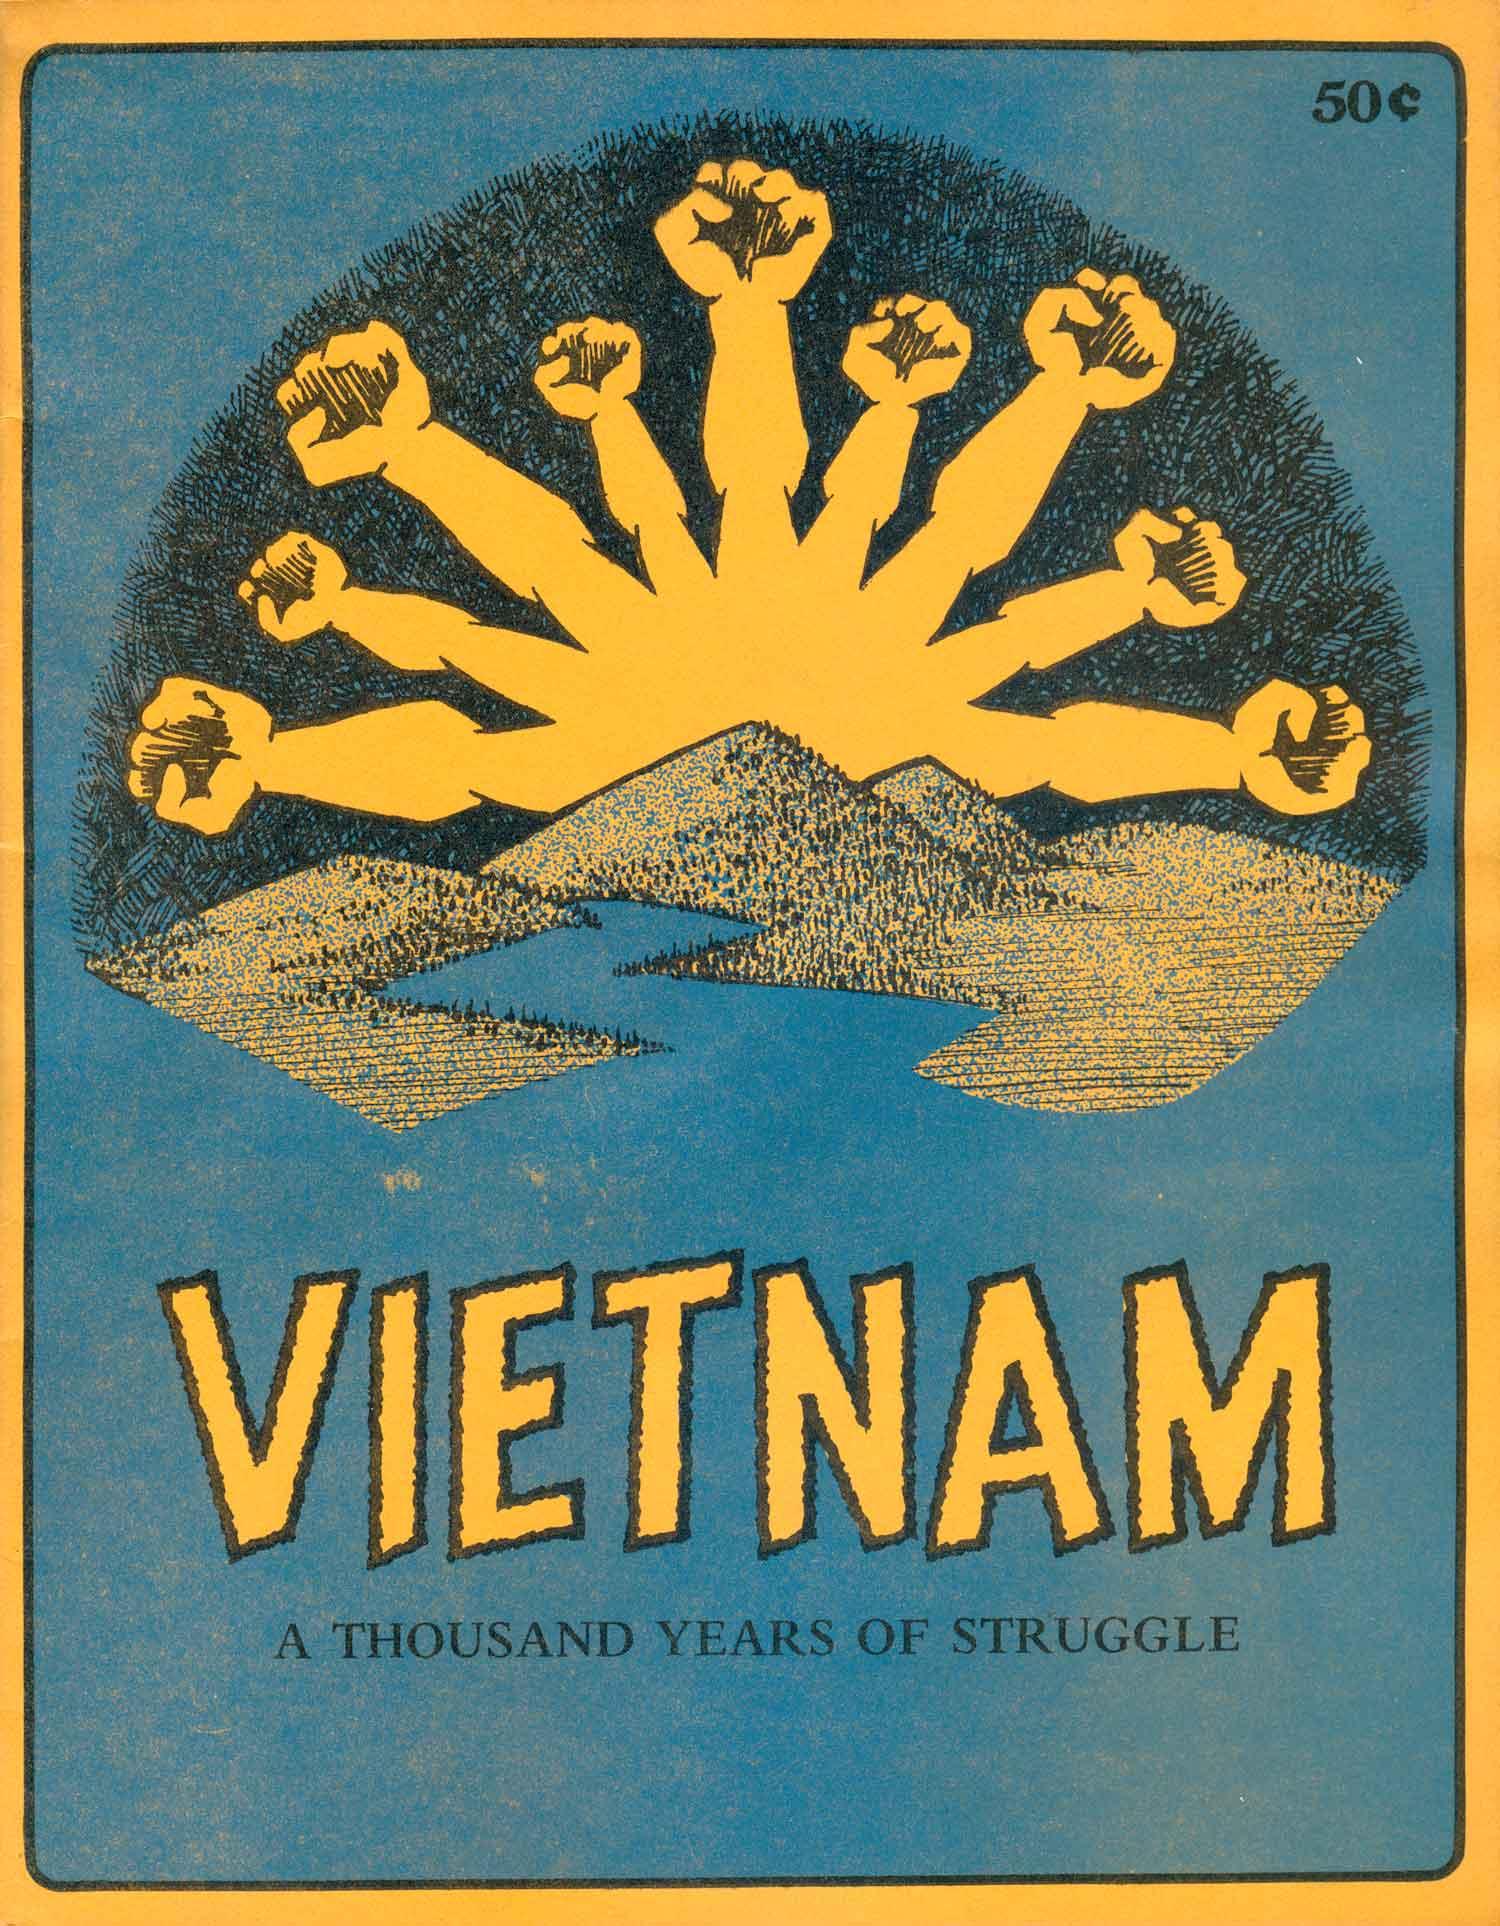 cannon_vietnam_1969